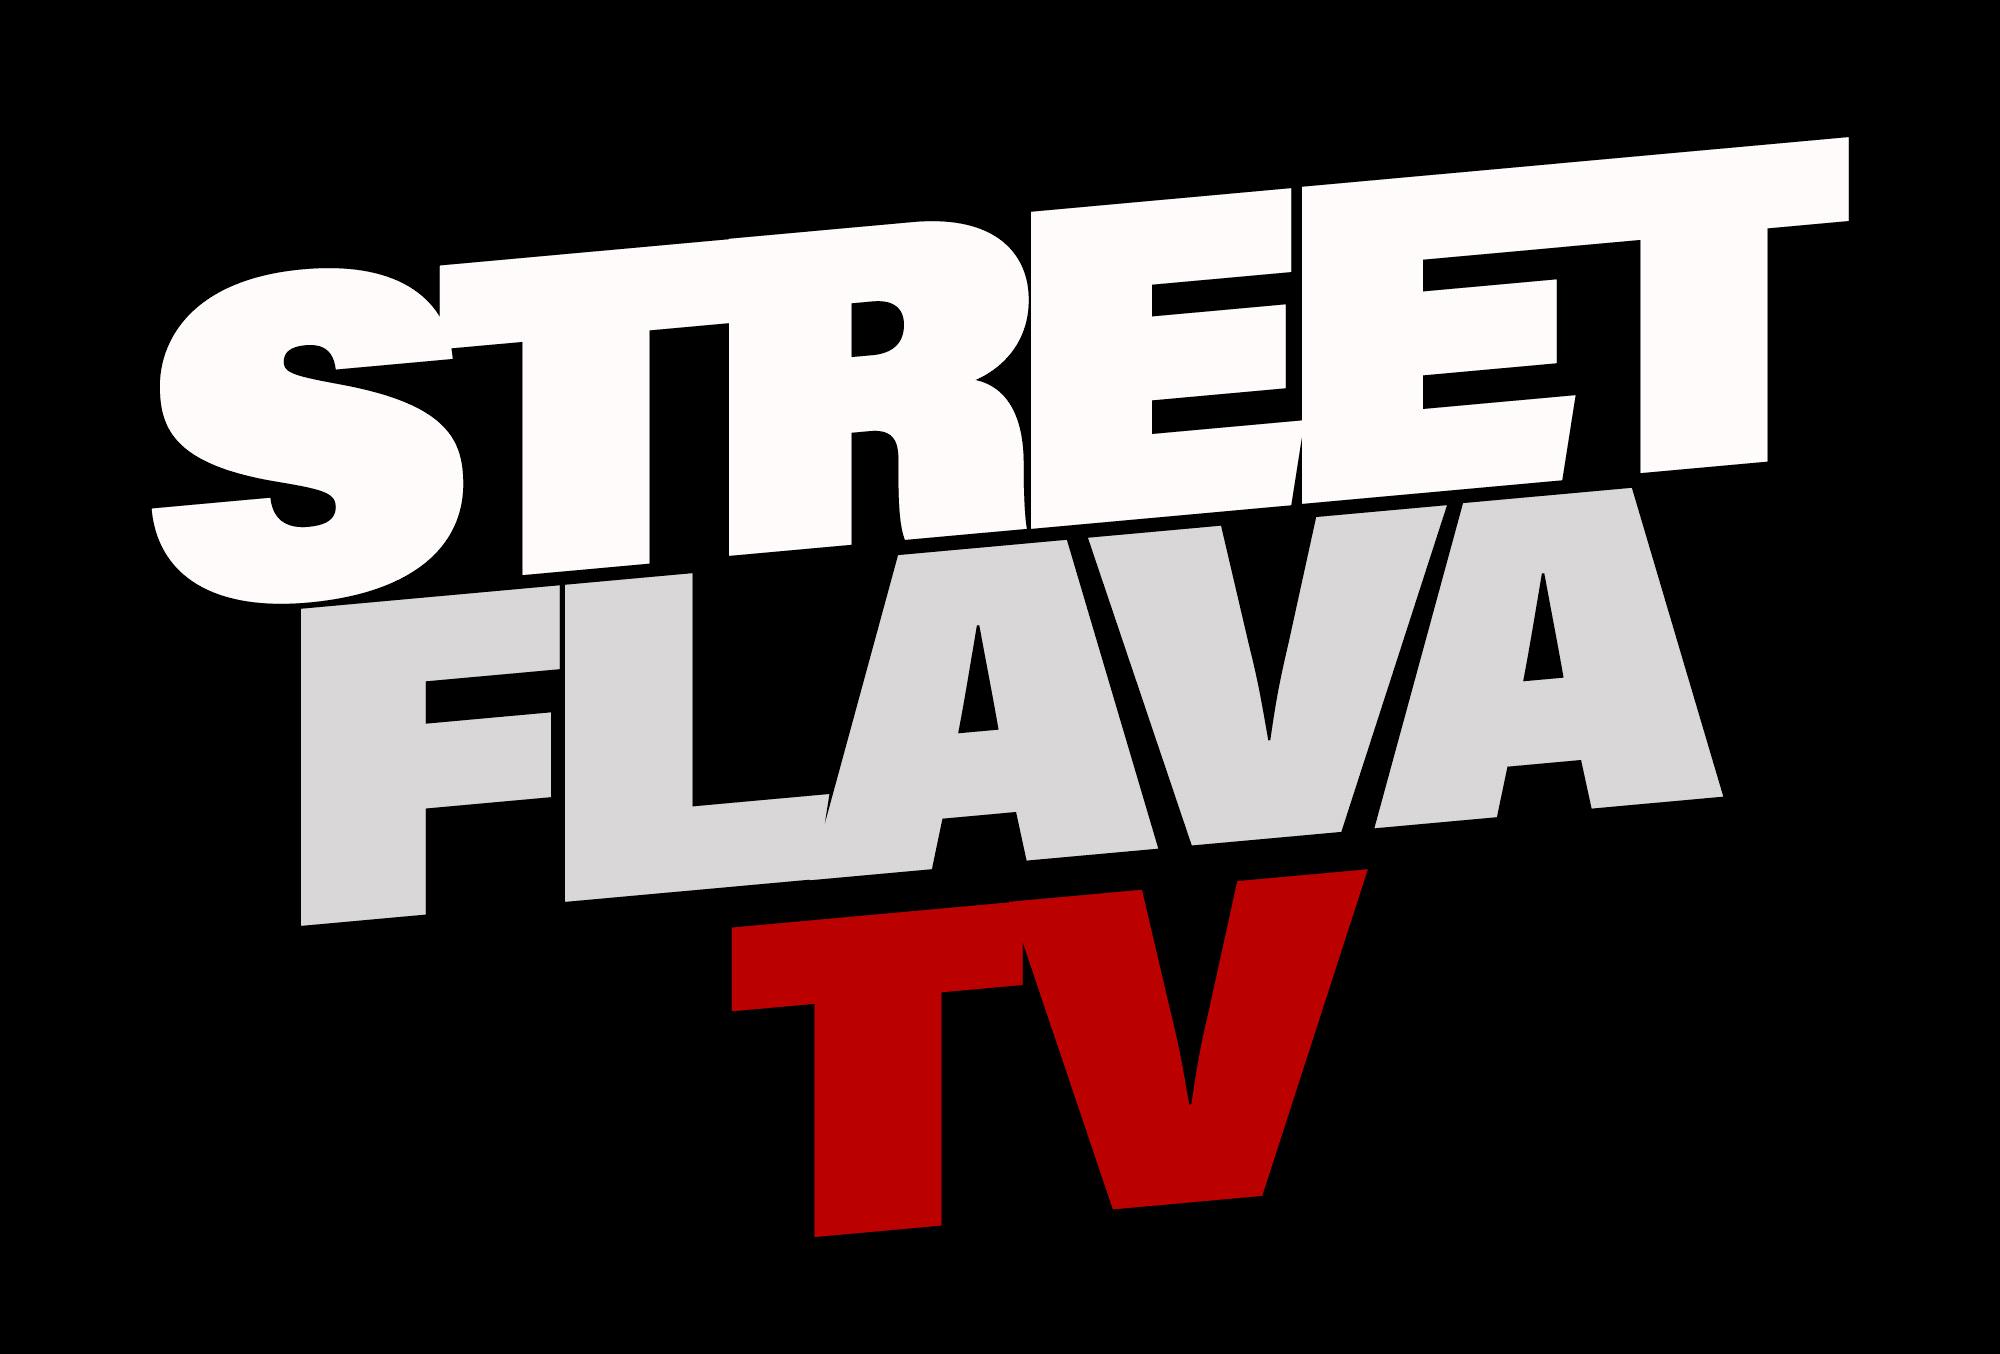 Street Flava Radio logo